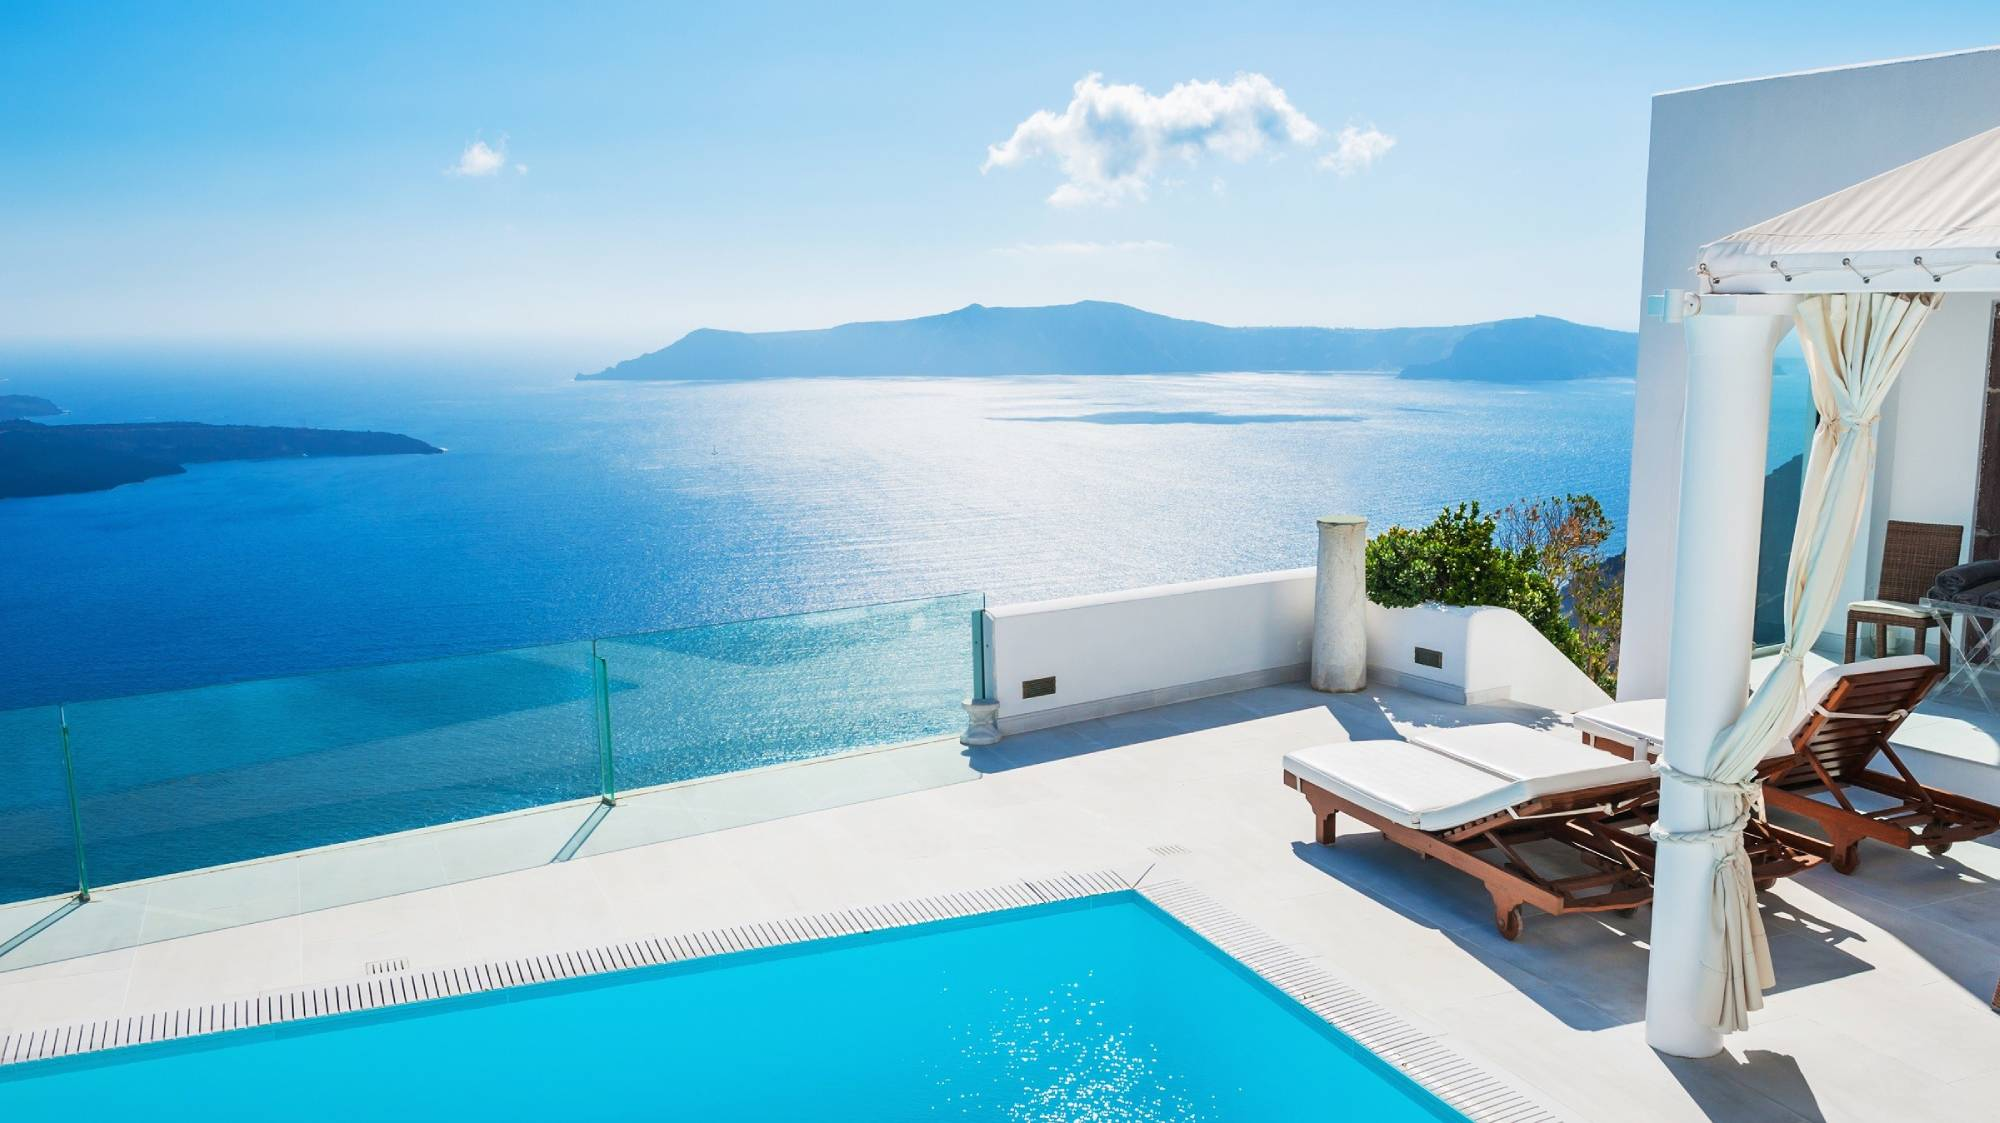 Santorini - Travel Blog